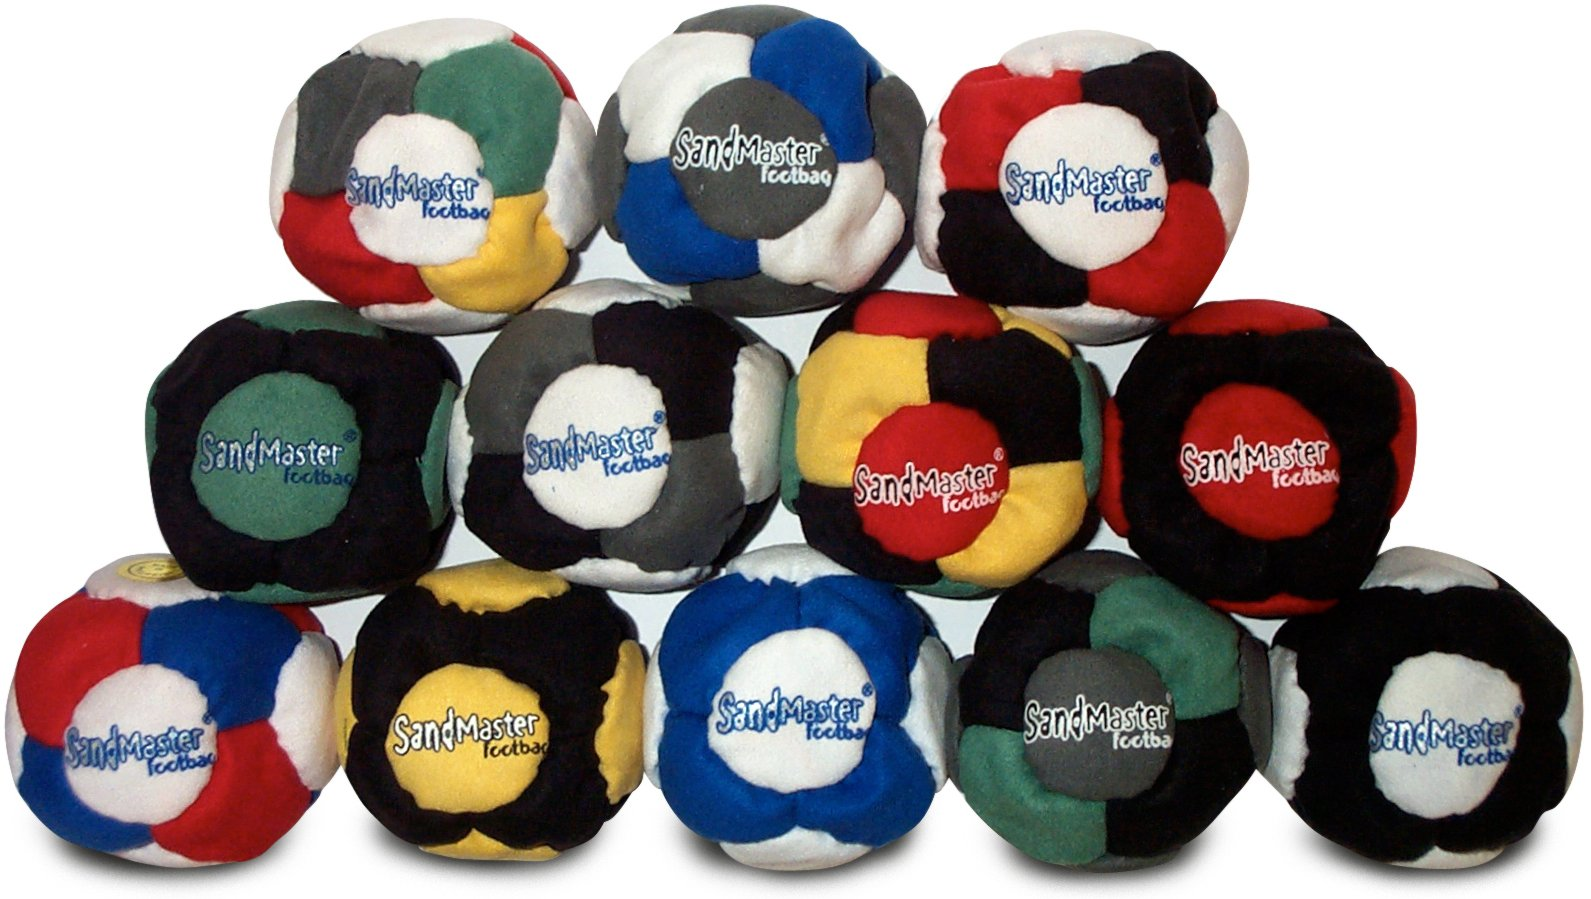 SandMaster Footbag Hacky Sack 12 pack